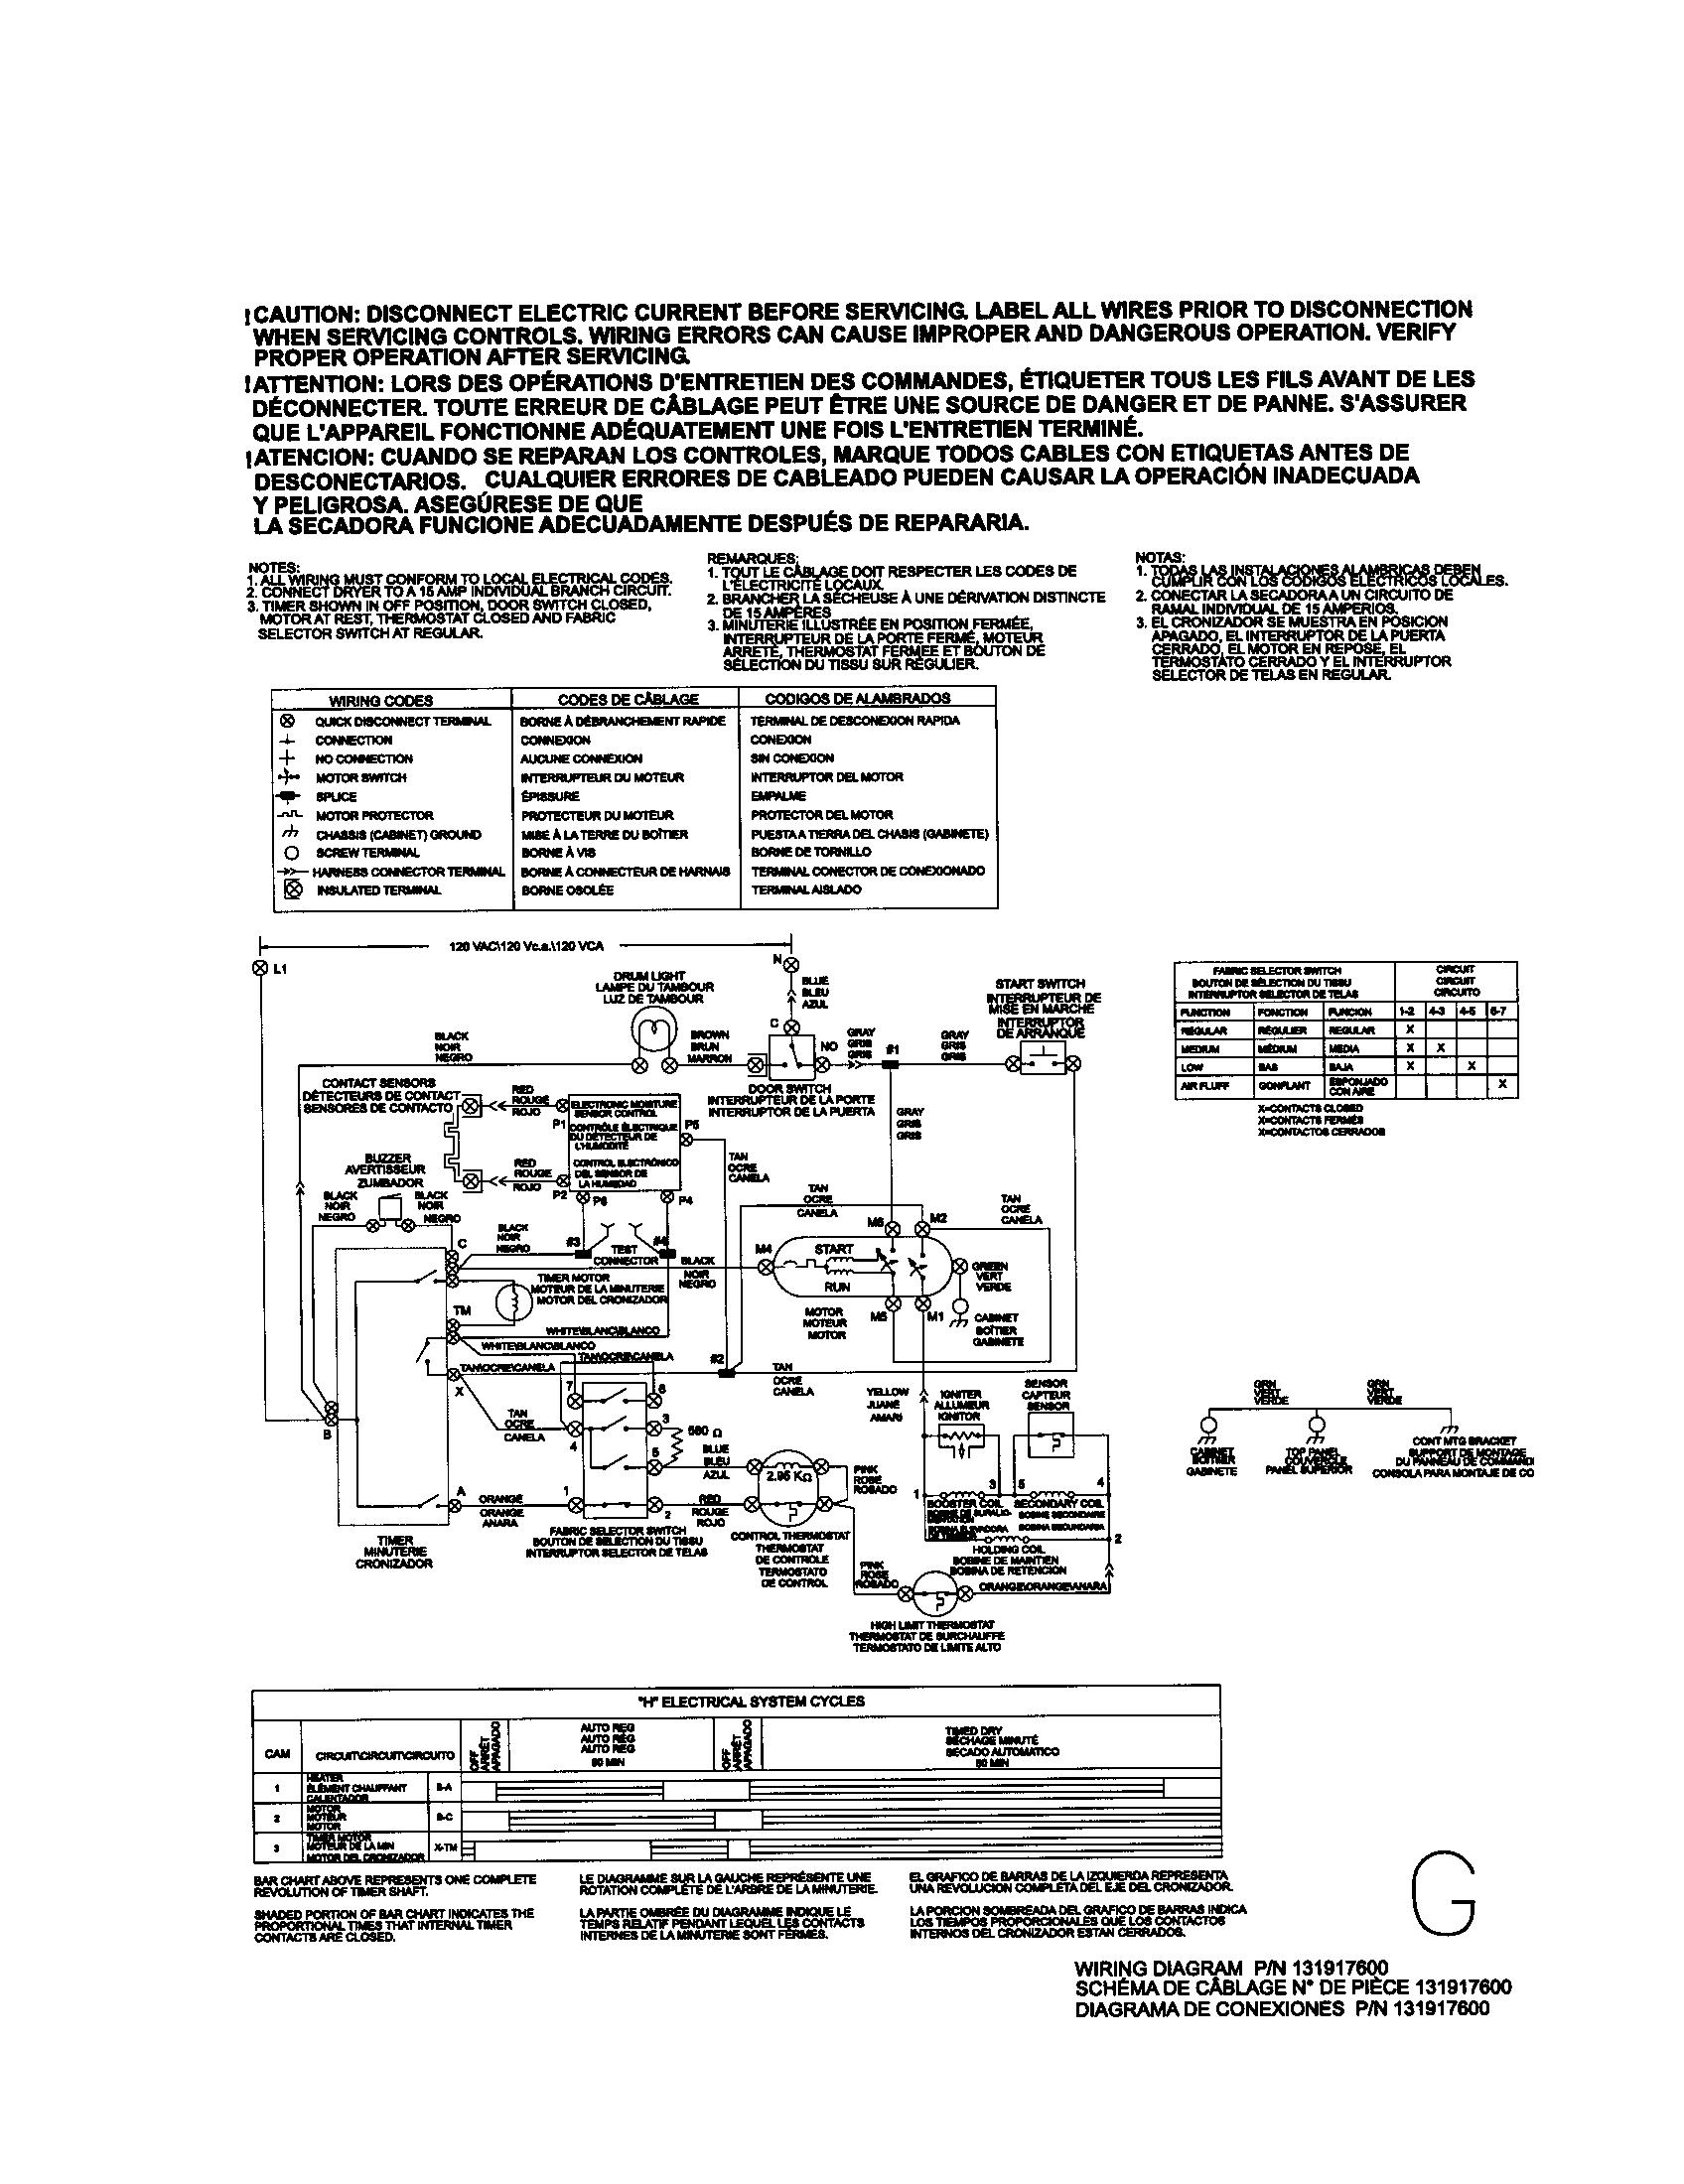 P0010298 00006?resize\=250%2C250\&ssl\=1 kenmore dryer model 11087872602 wiring diagram kenmore wiring  at couponss.co